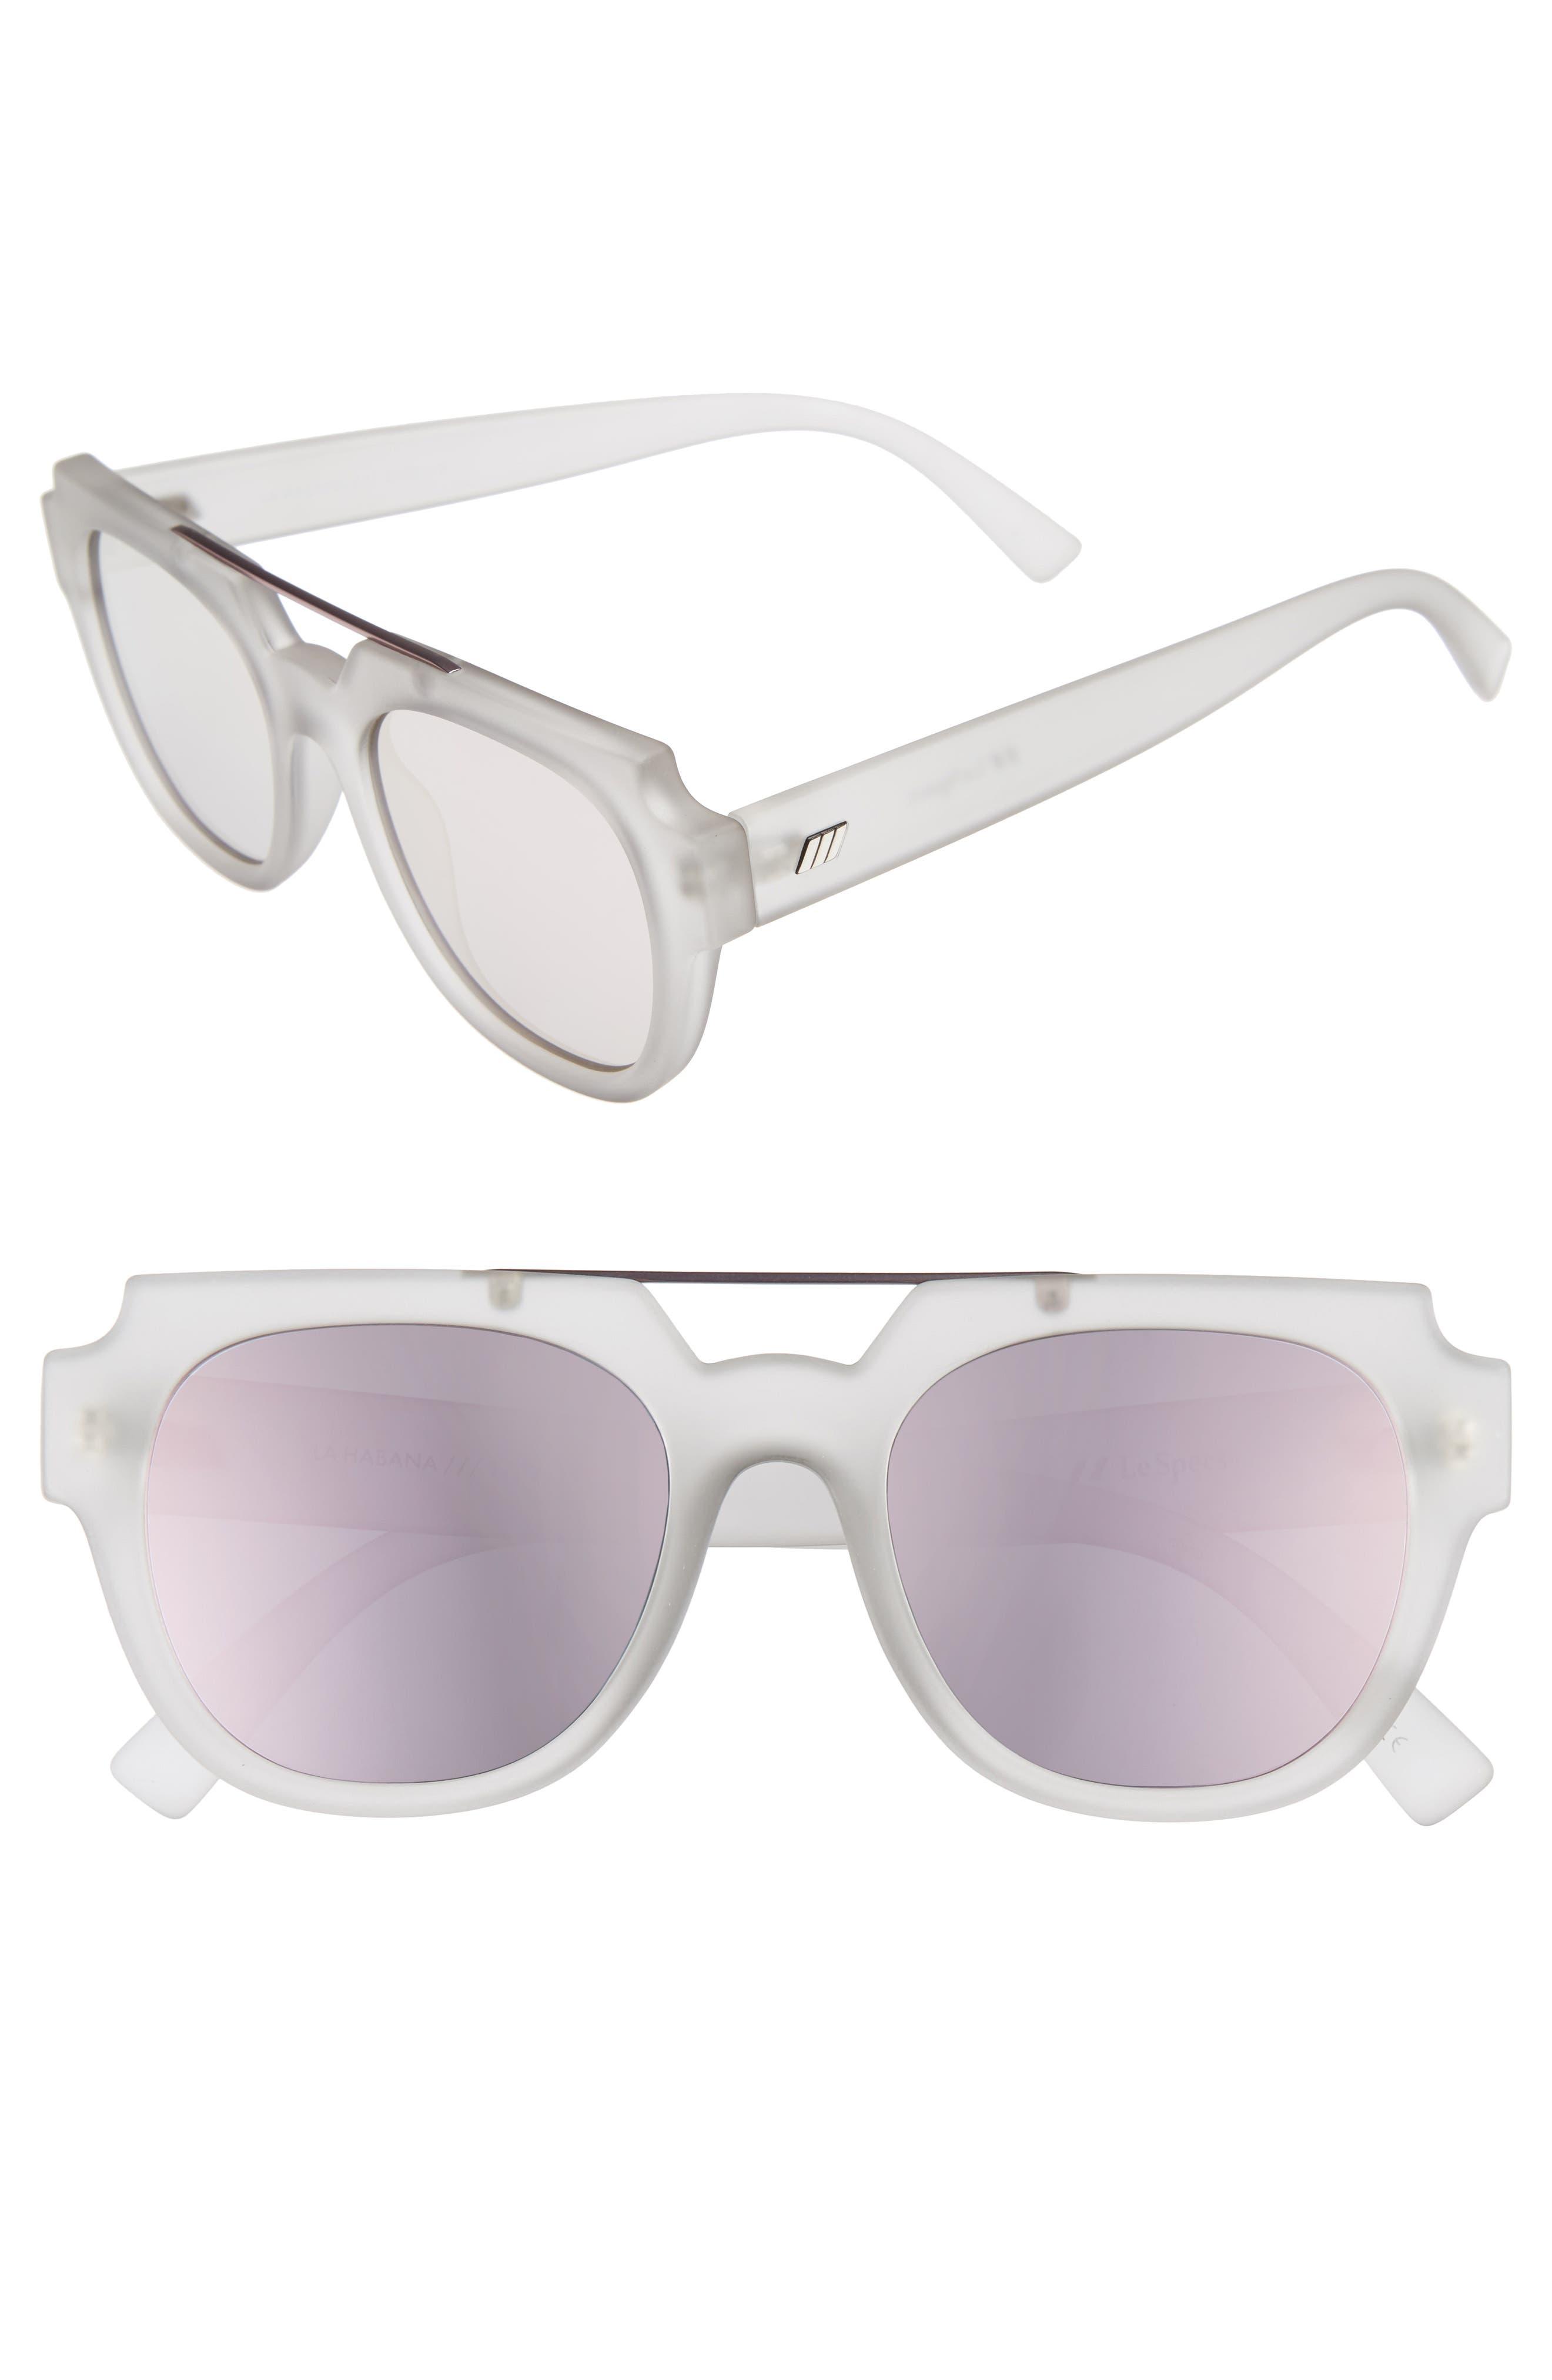 La Habana 52mm Retro Sunglasses,                             Main thumbnail 2, color,